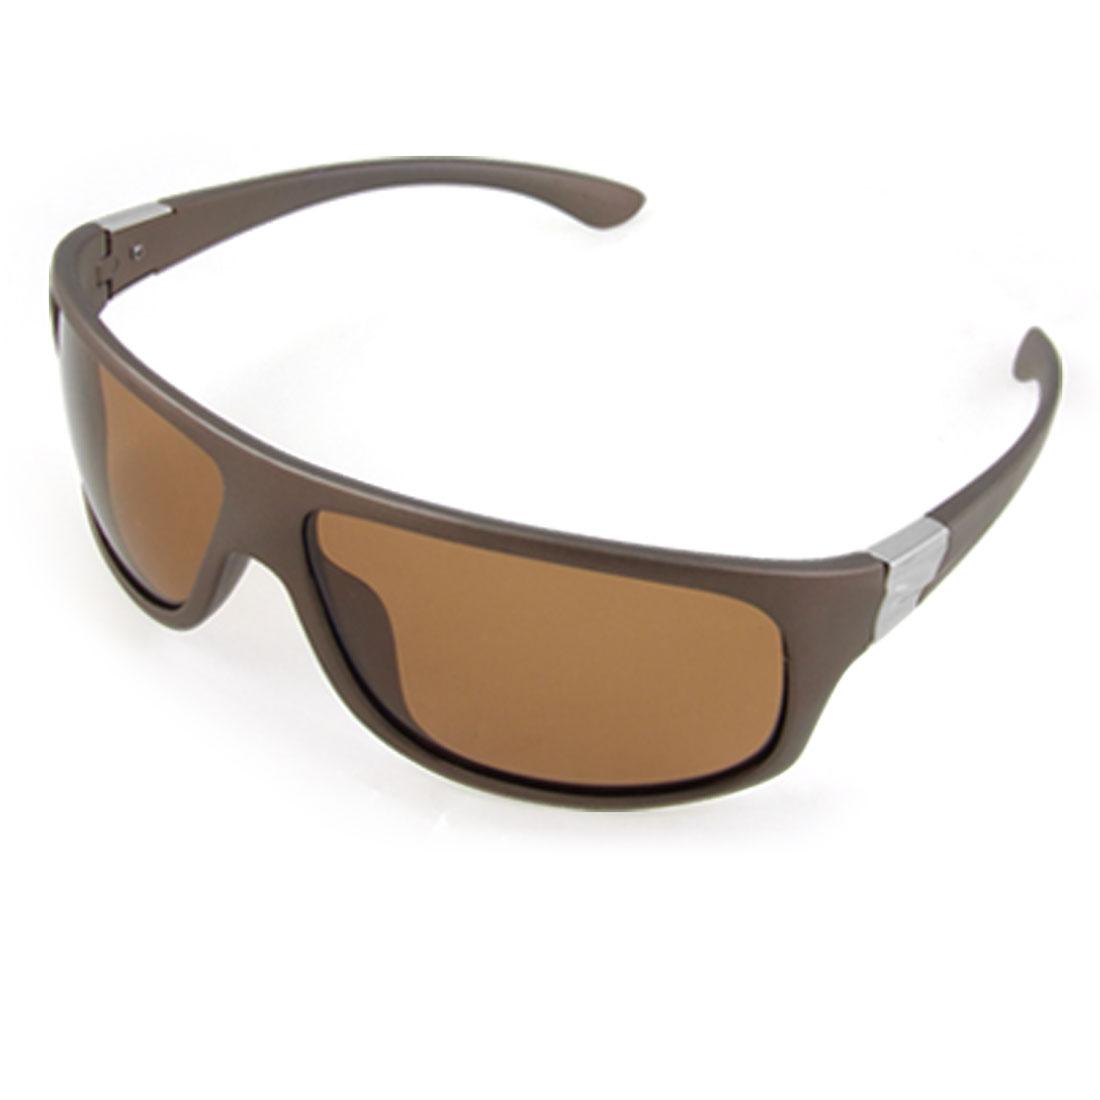 Tawny Full Frame Sunglasses Unisex Polarized Eyewear w Pouch